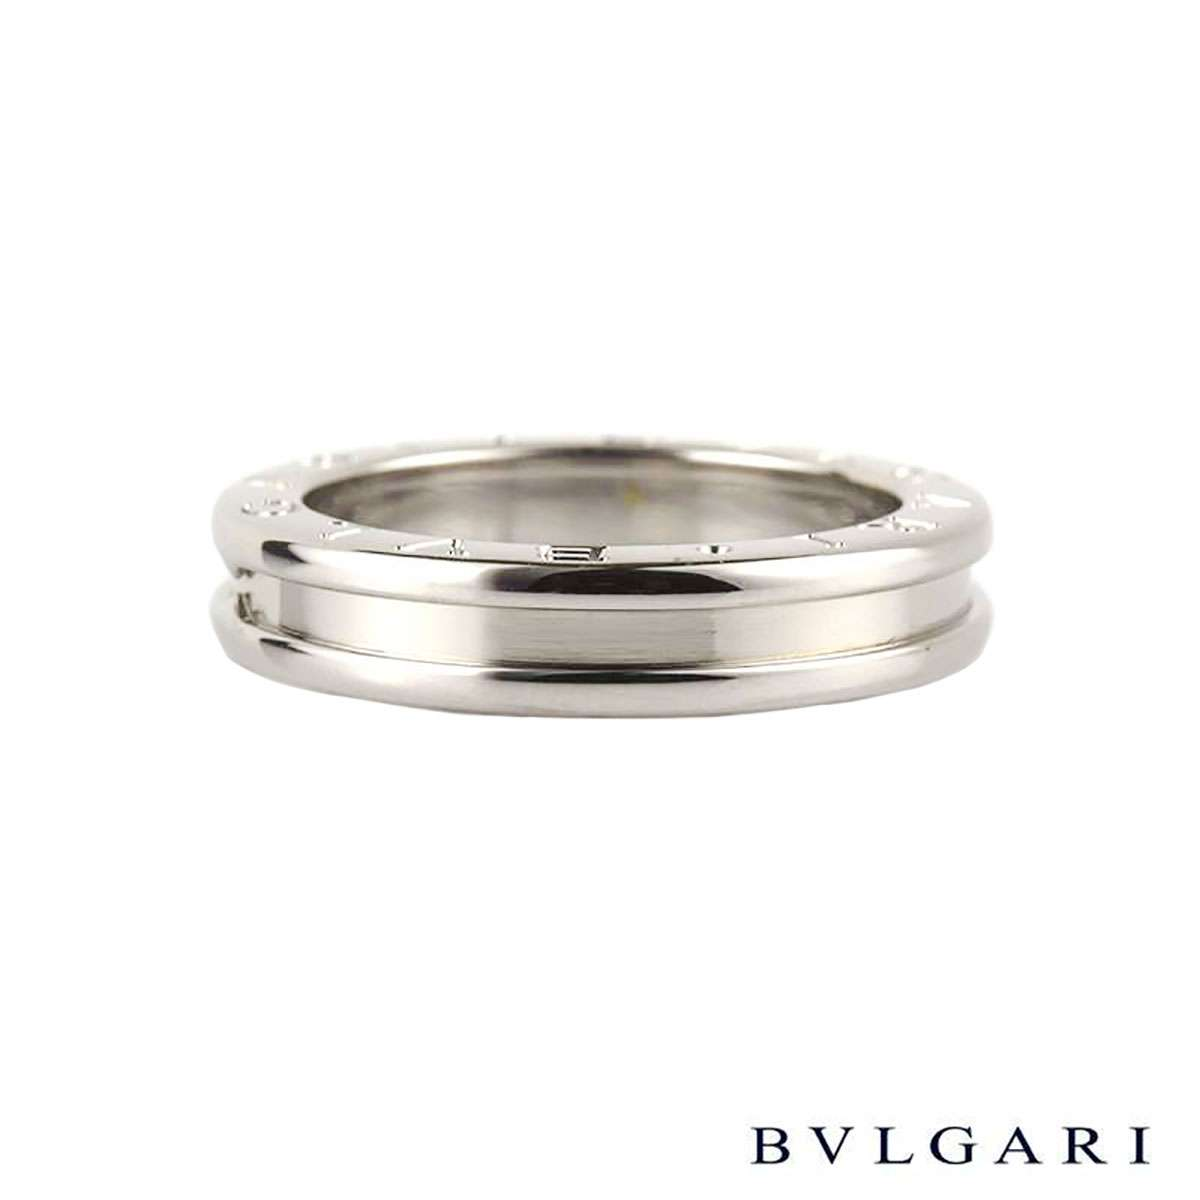 Bvlgari 18k white gold B.zero1 Ring Size 50 AN852423